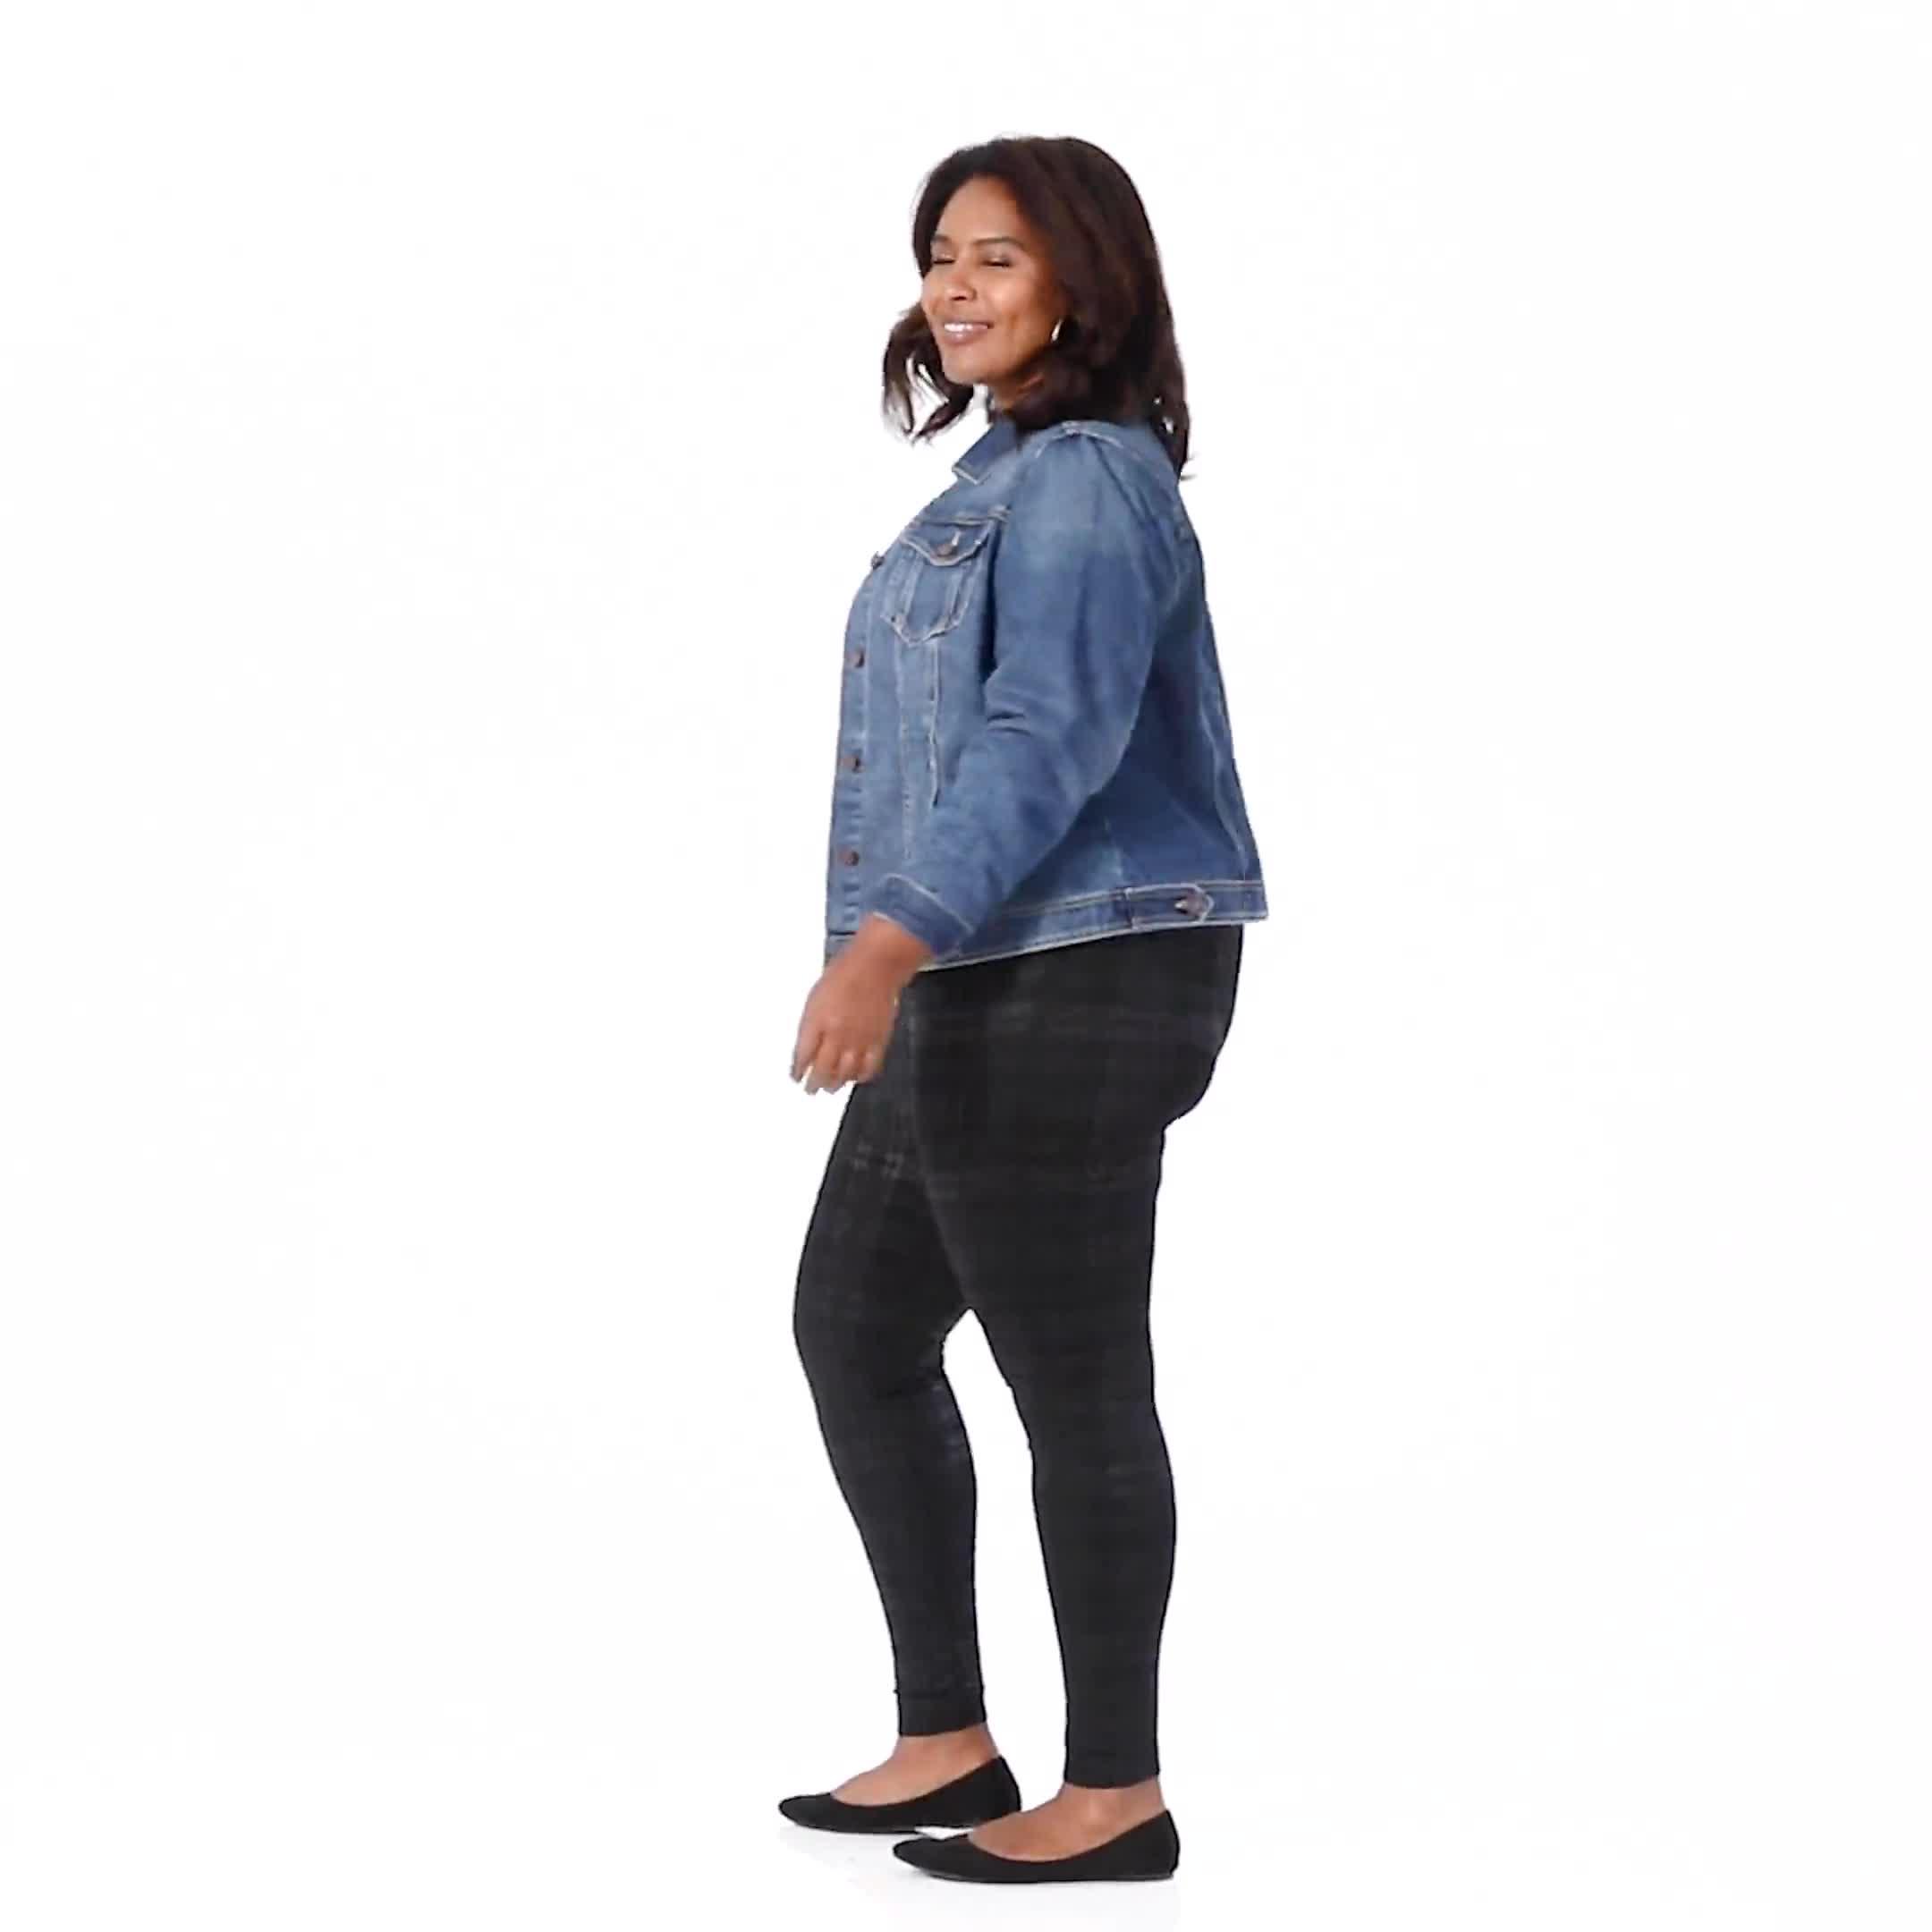 Elo Sportwear Black Plaid Legging - Plus - Video